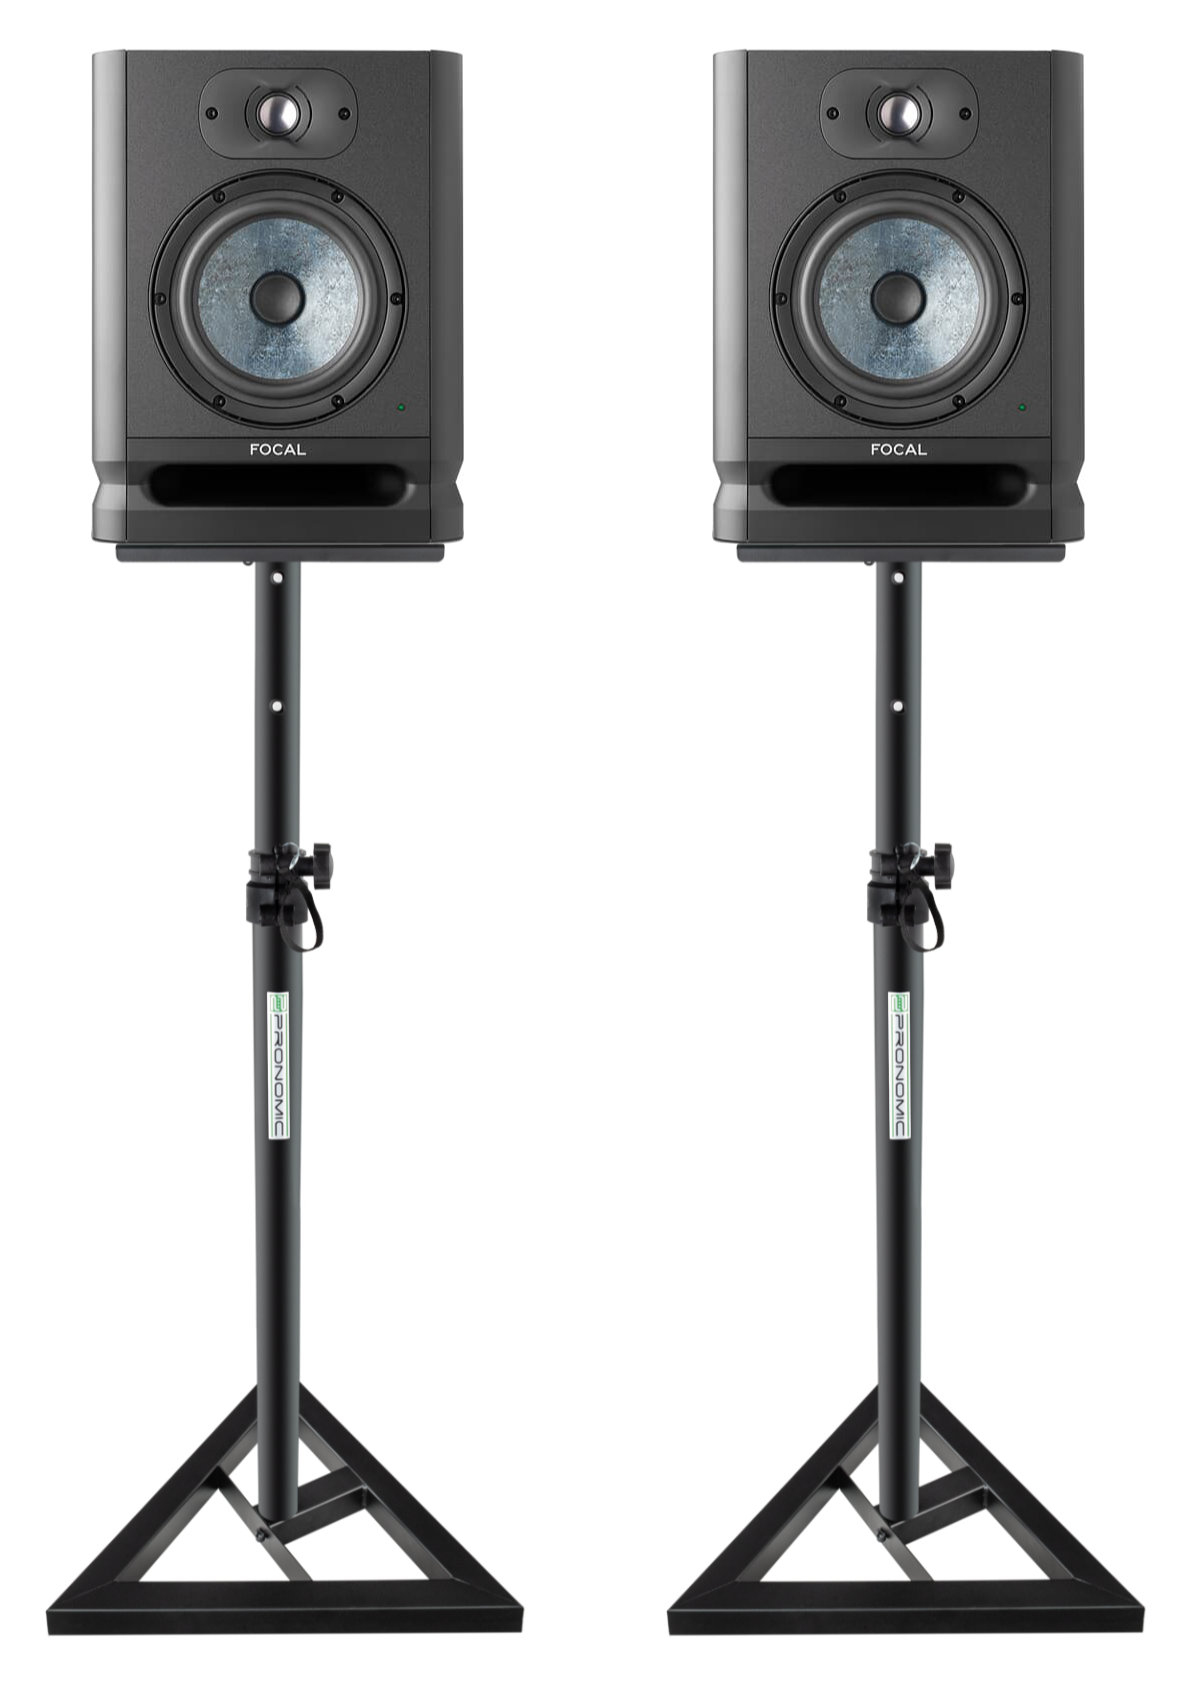 Studiomonitore - Focal Alpha EVO 65 Studiomonitor Set Stativ - Onlineshop Musikhaus Kirstein